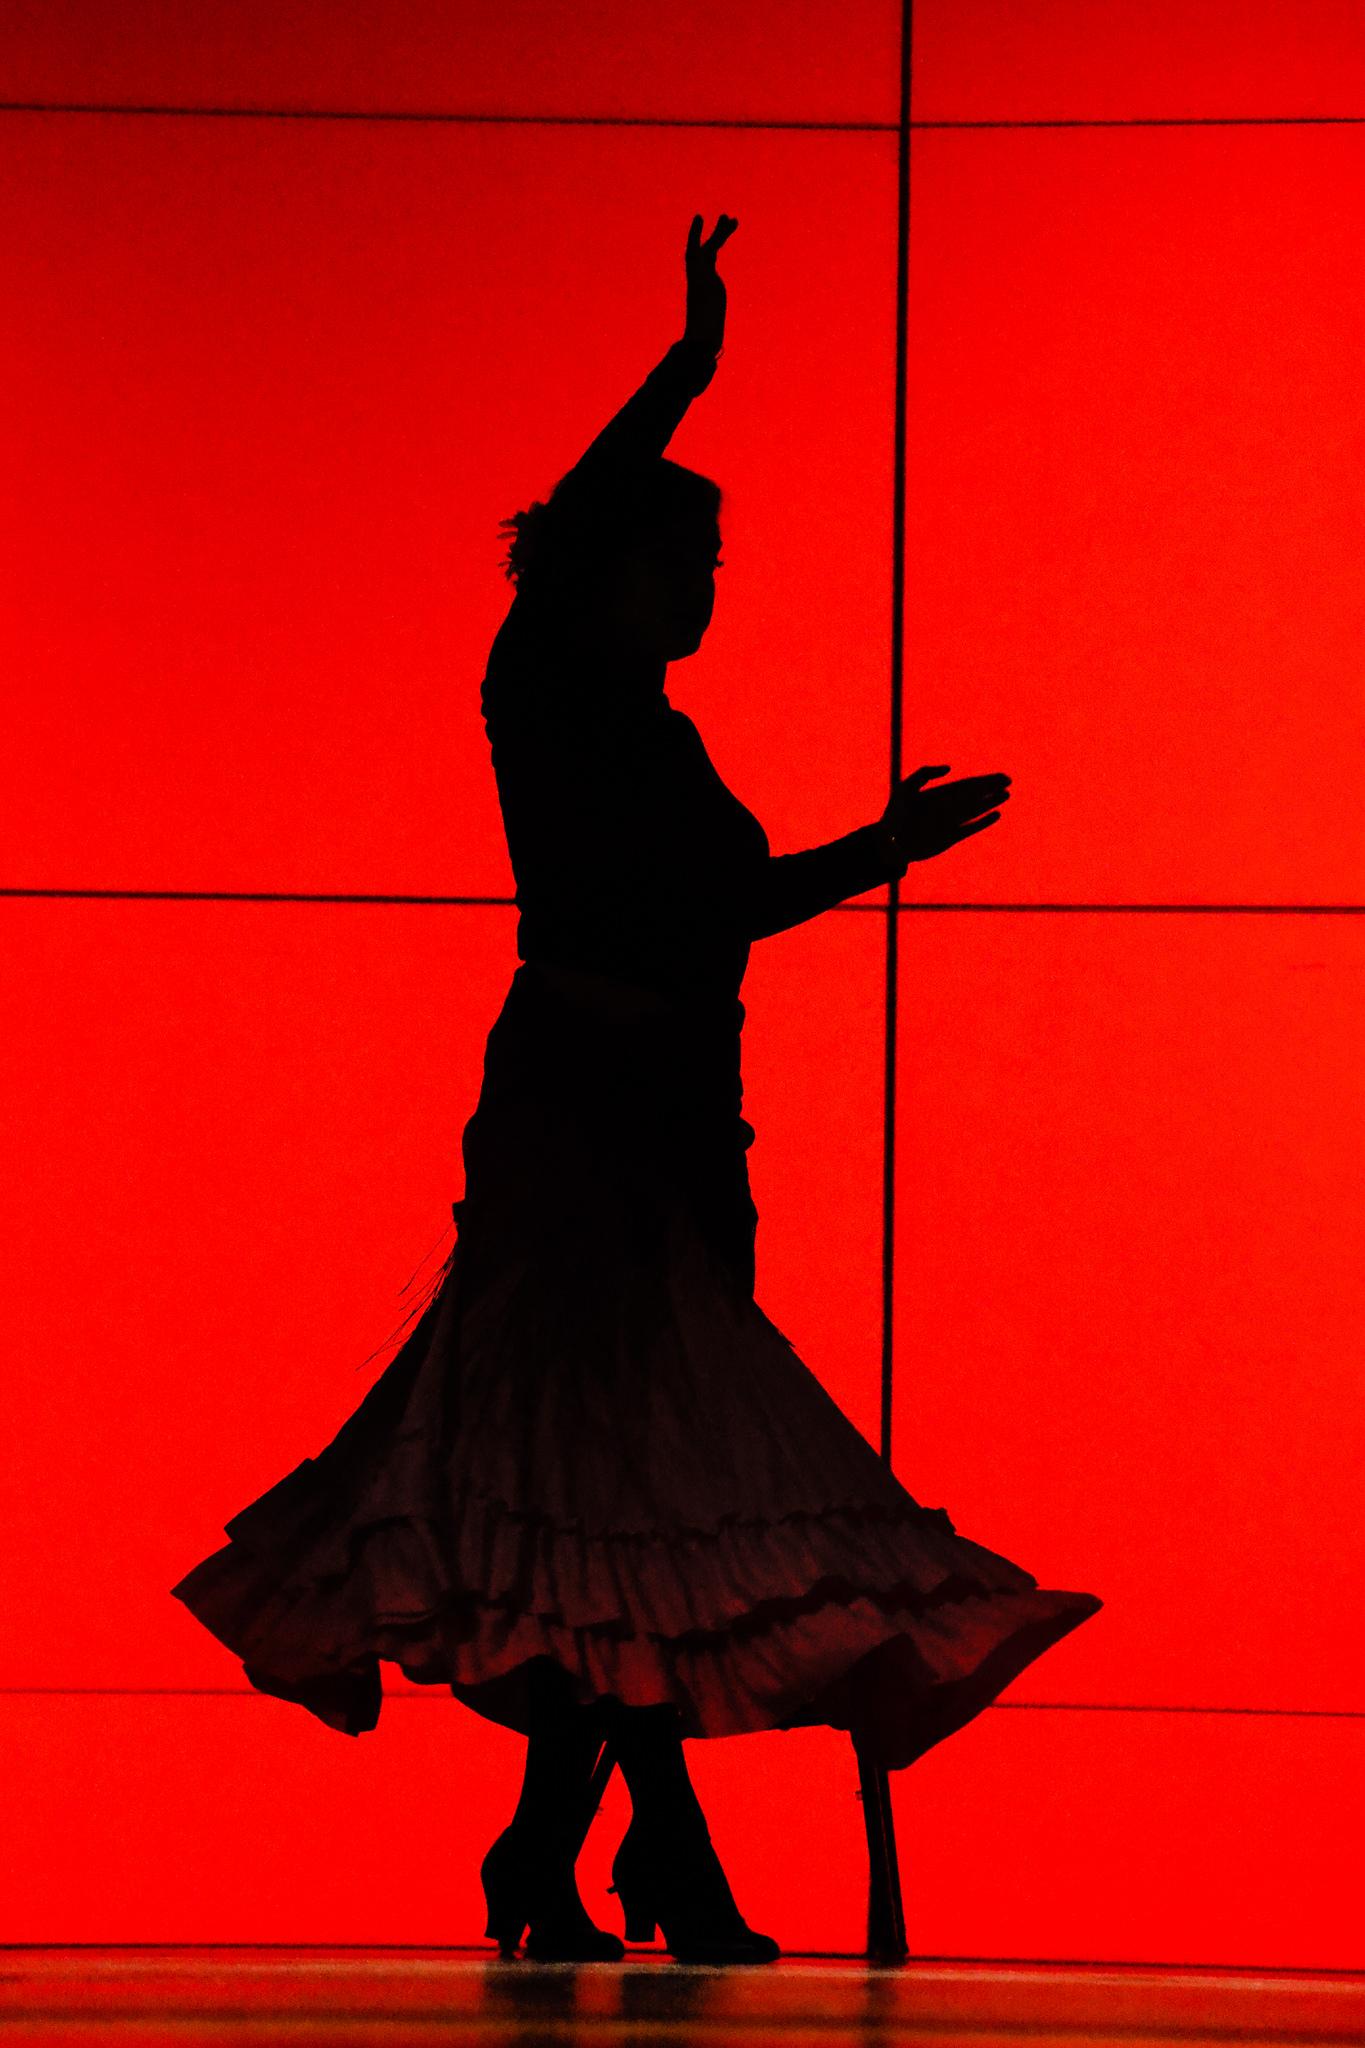 The Salsa Dancer | © Maria/Flickr